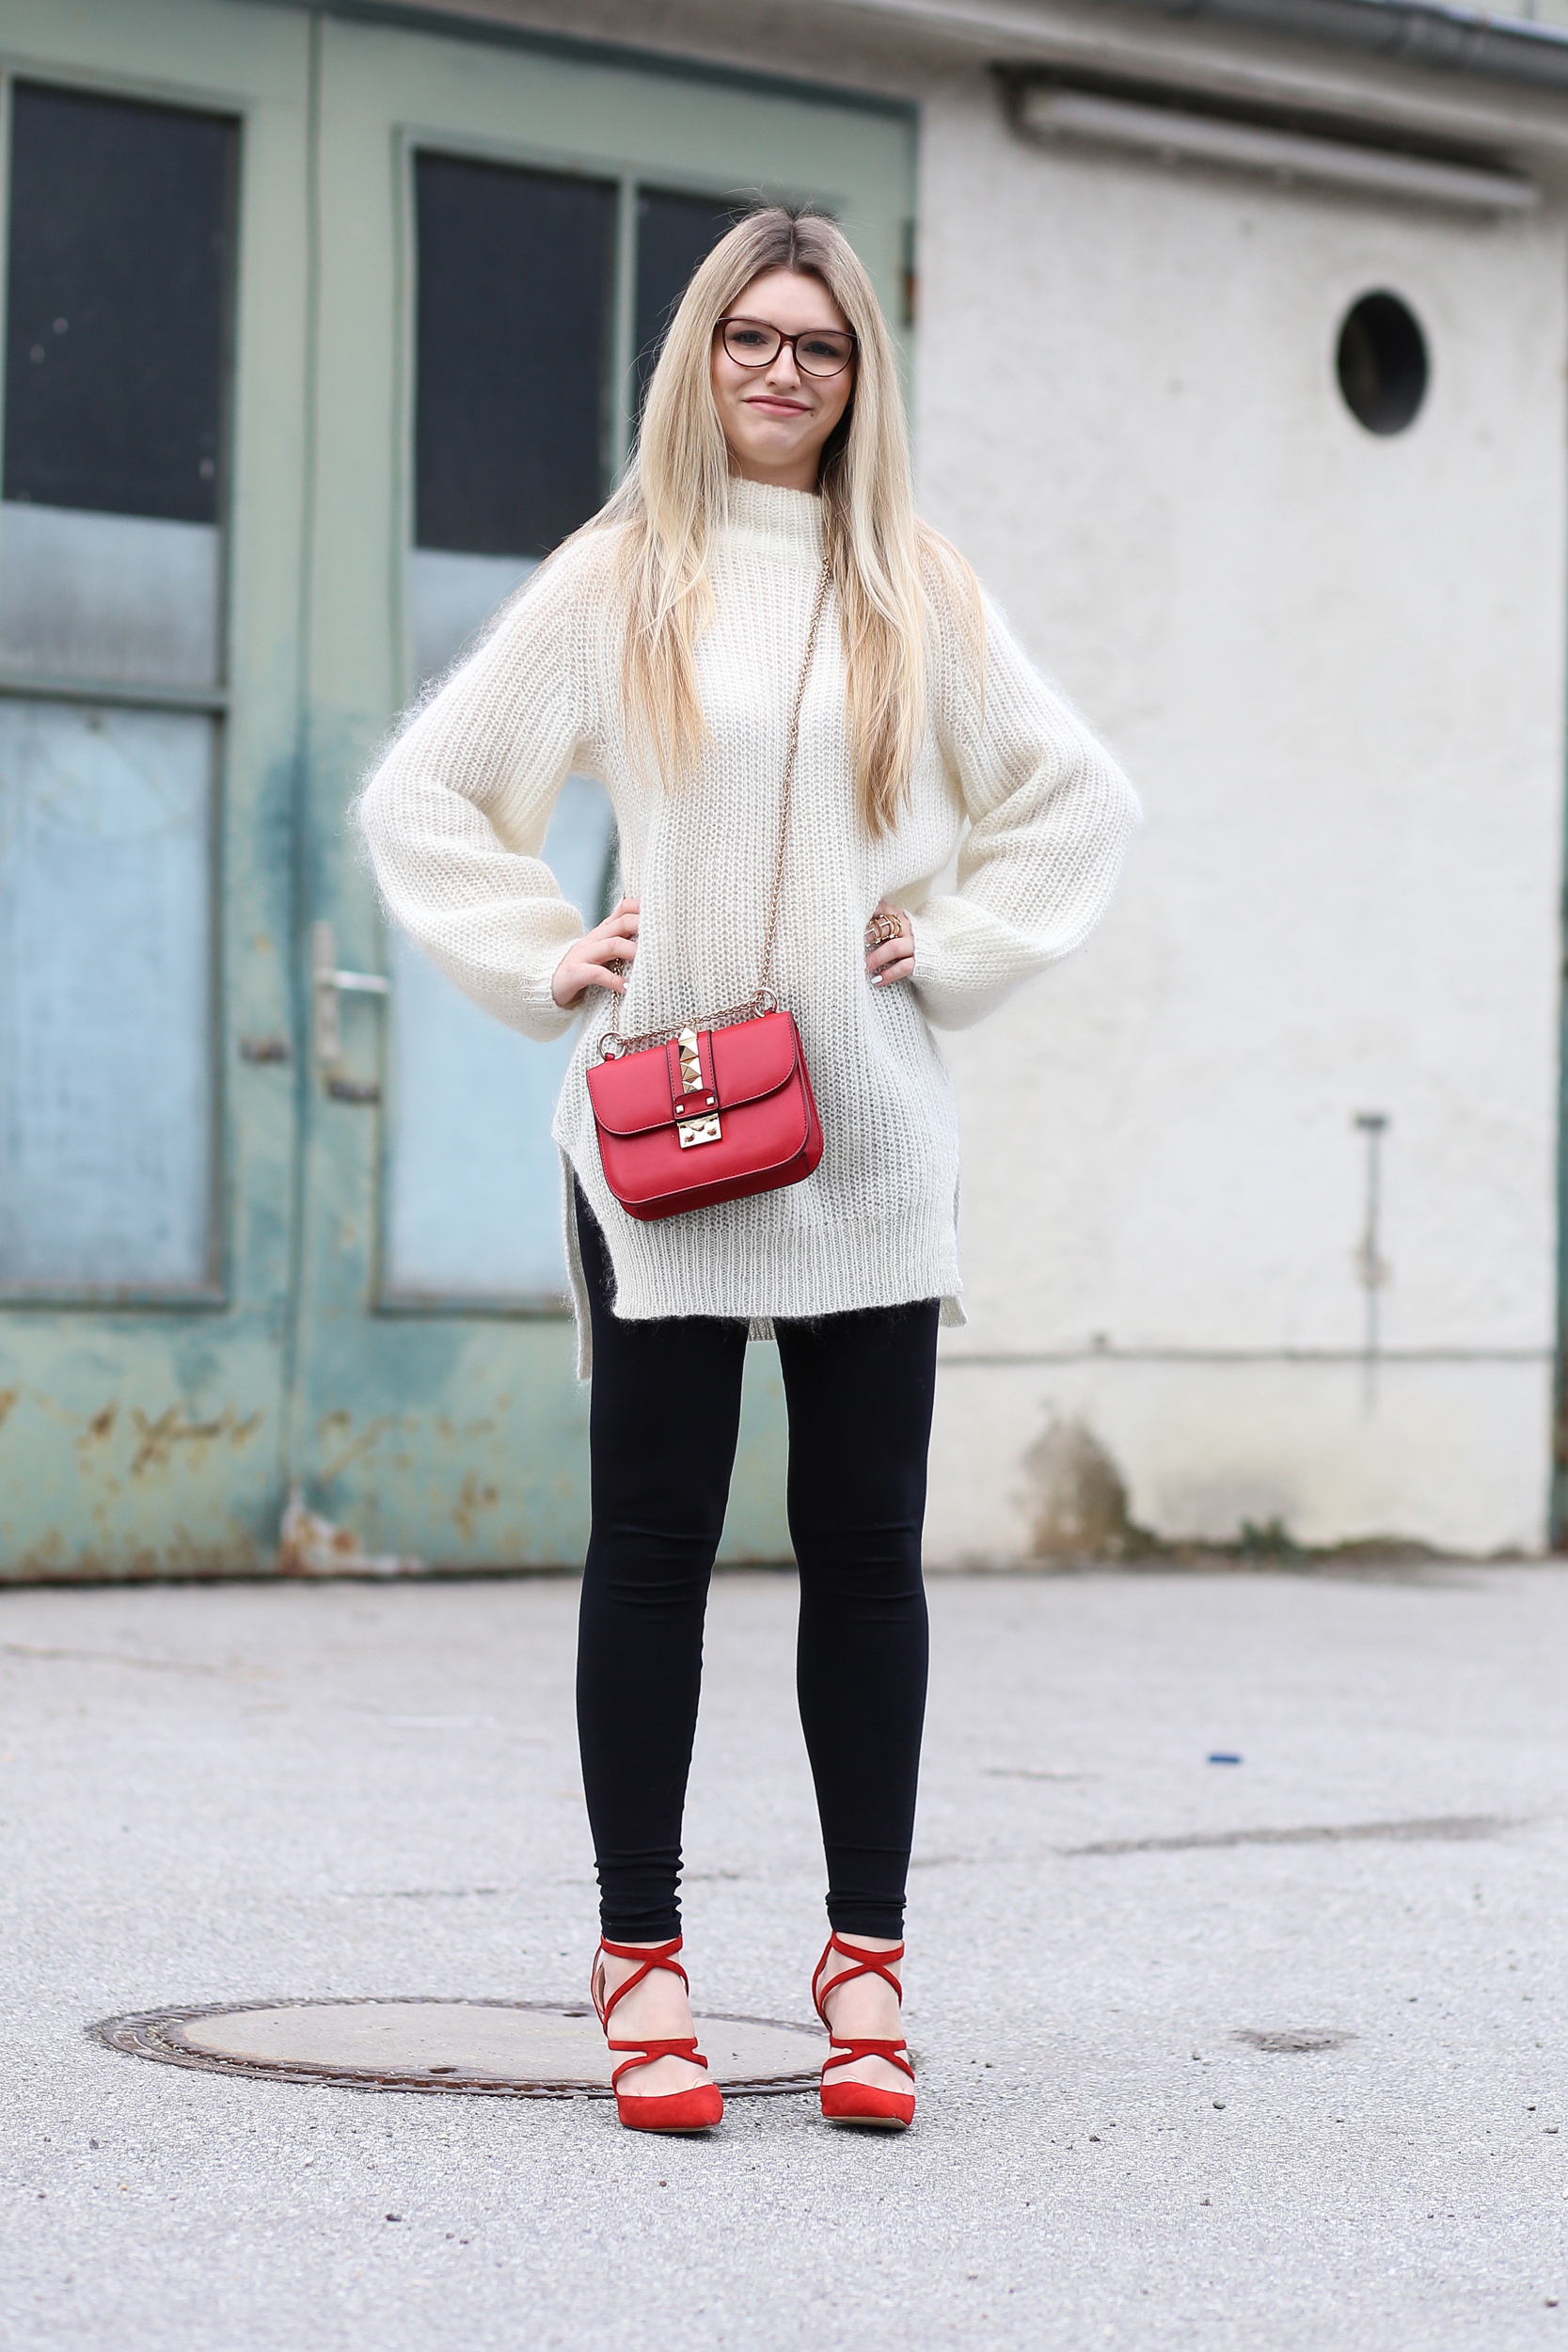 franziska-elea-blogger-aus-muenchen-fashionblog-mode-blog-outfit-oversize-pullover-edited-valentino-rockstud-umhaengetasche-doppelkinn-witzig